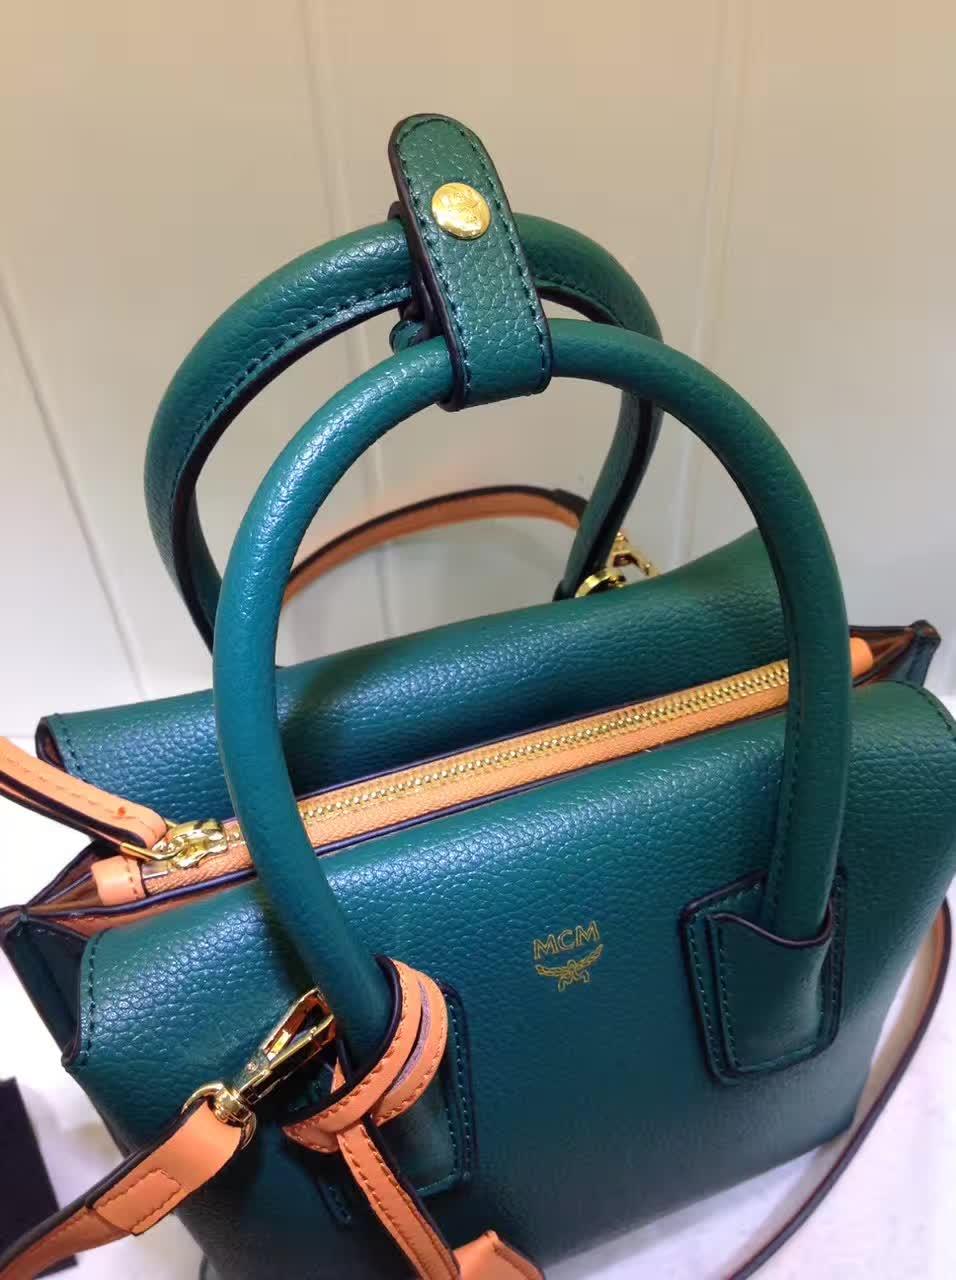 MCM韩国官网 Milla单肩包 原版特殊颗粒牛皮 崭新袋口开合设计 墨绿色